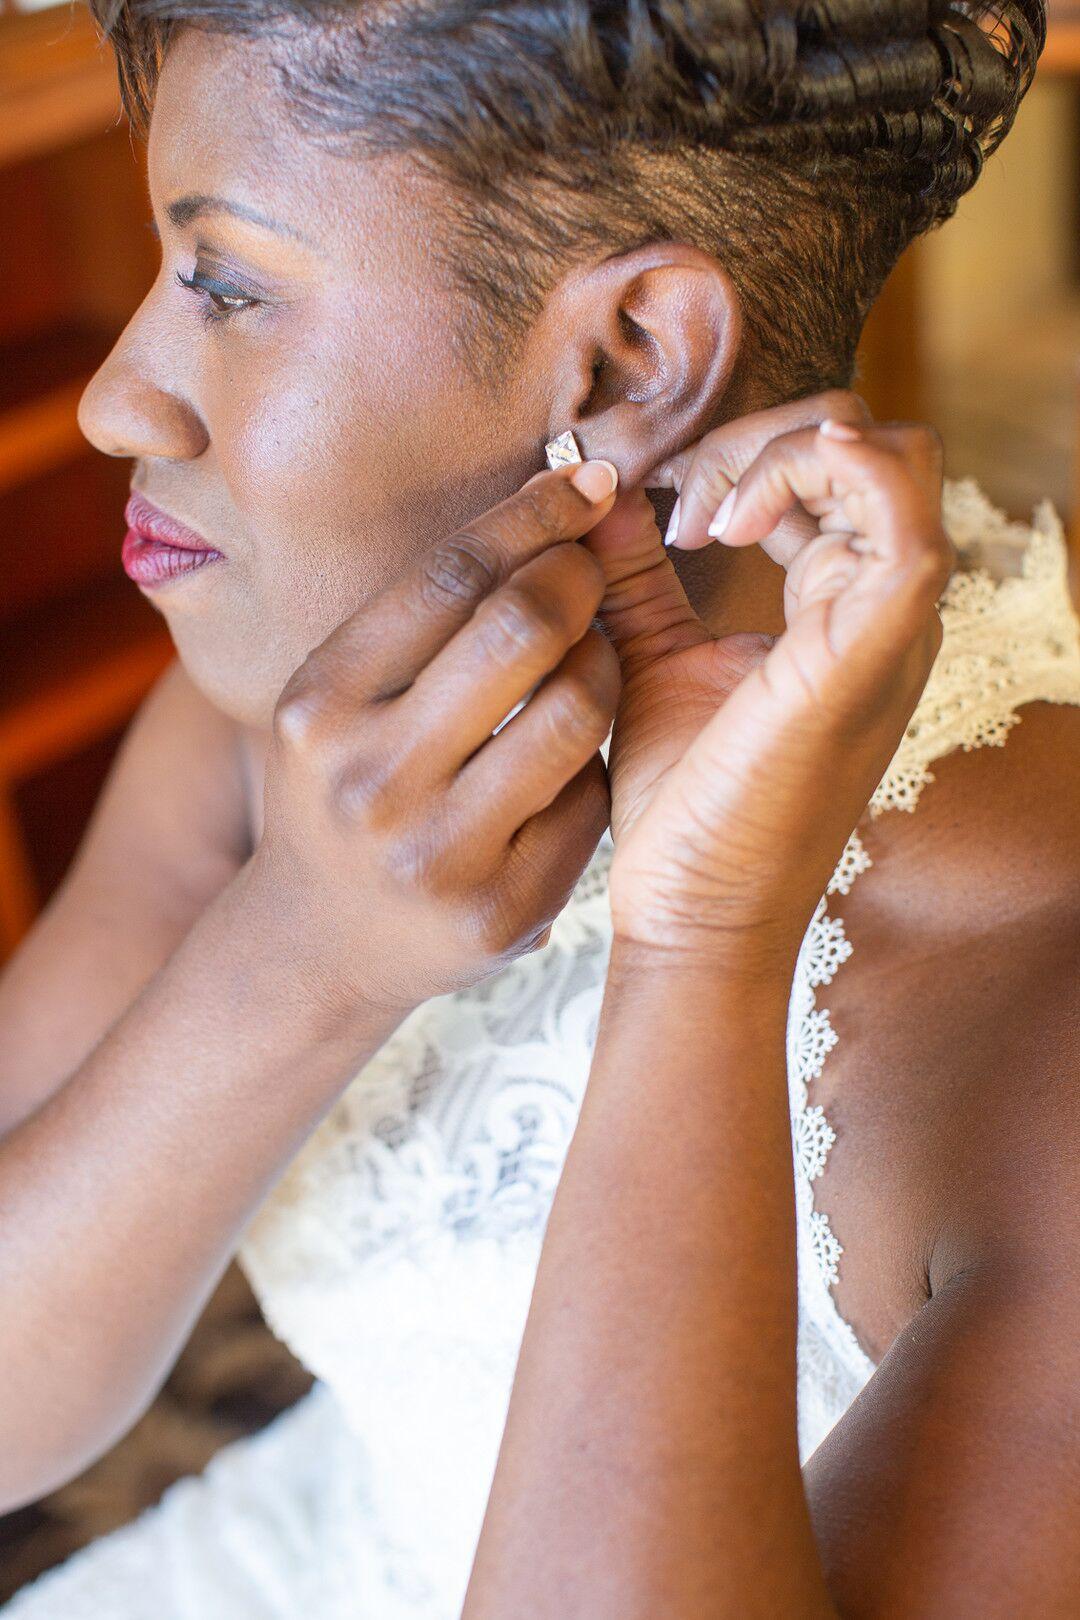 www.santabarbarawedding.com | Venue: The Casitas of Arroyo Grande | Photographer: Renoda Campbell Photography | Second Shooter: John Patrick Images |  Bride Placing Earrings